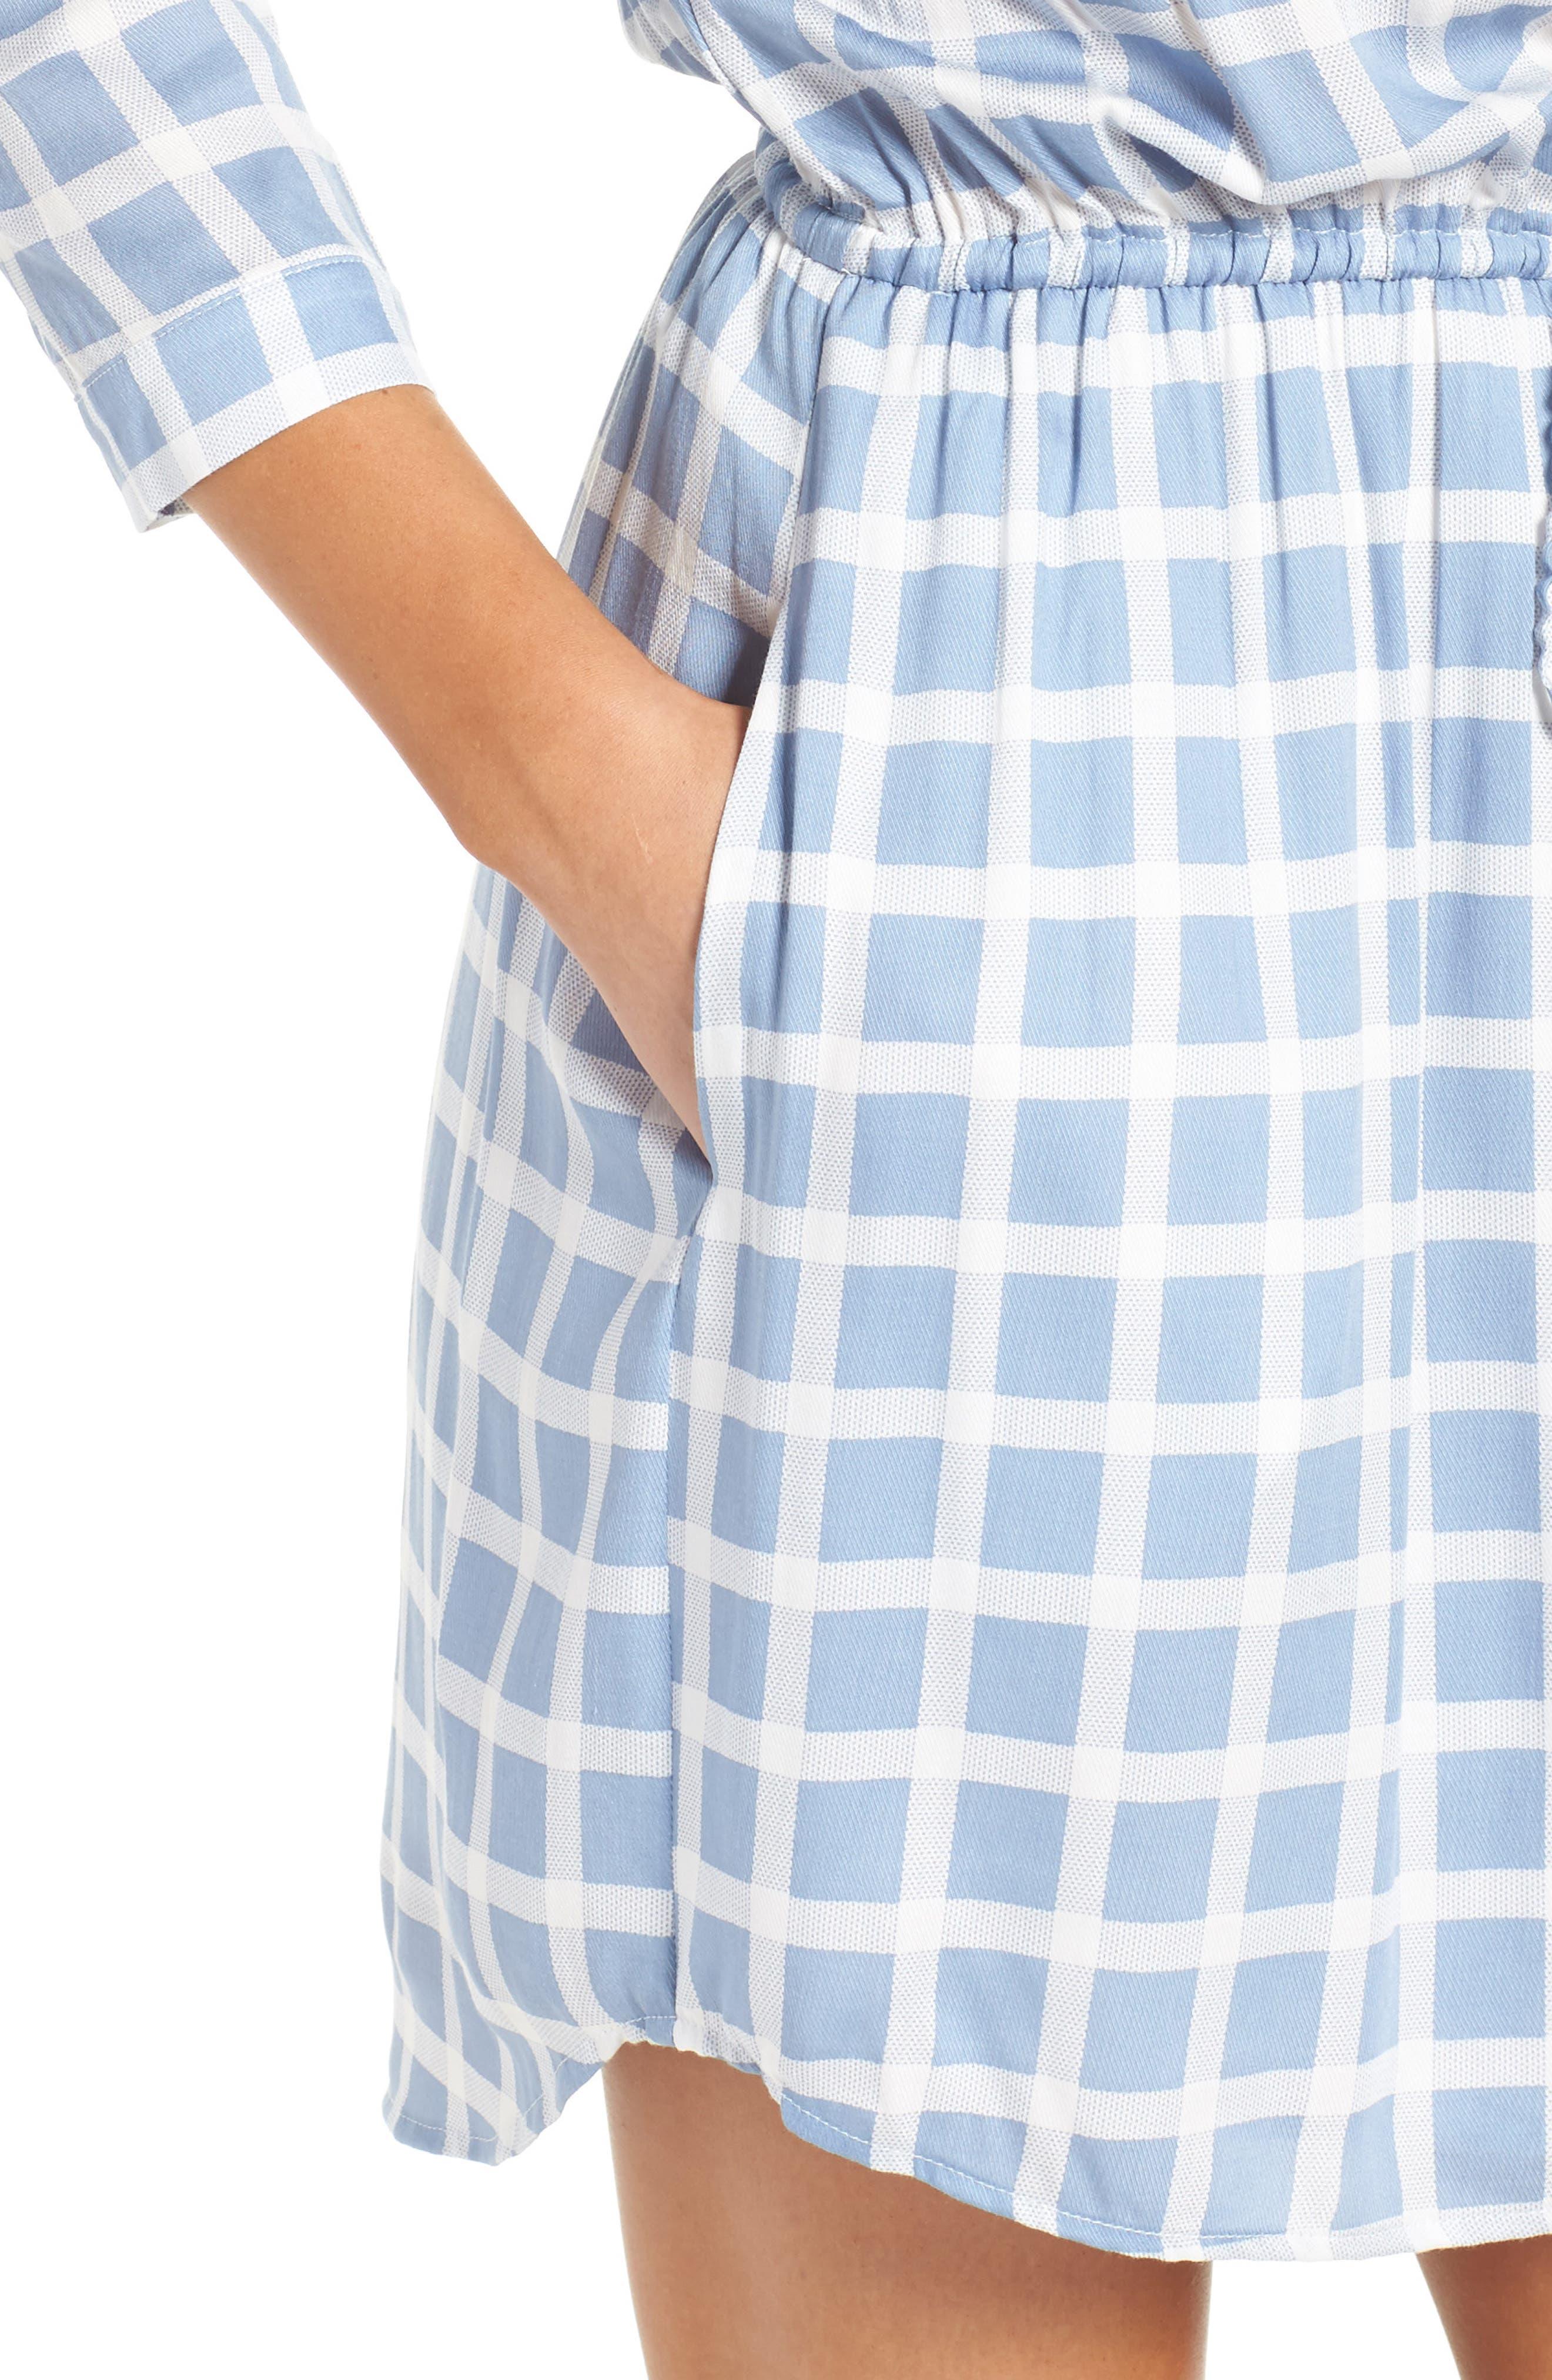 Daniella Plaid Shirtdress,                             Alternate thumbnail 4, color,                             Faded Denim